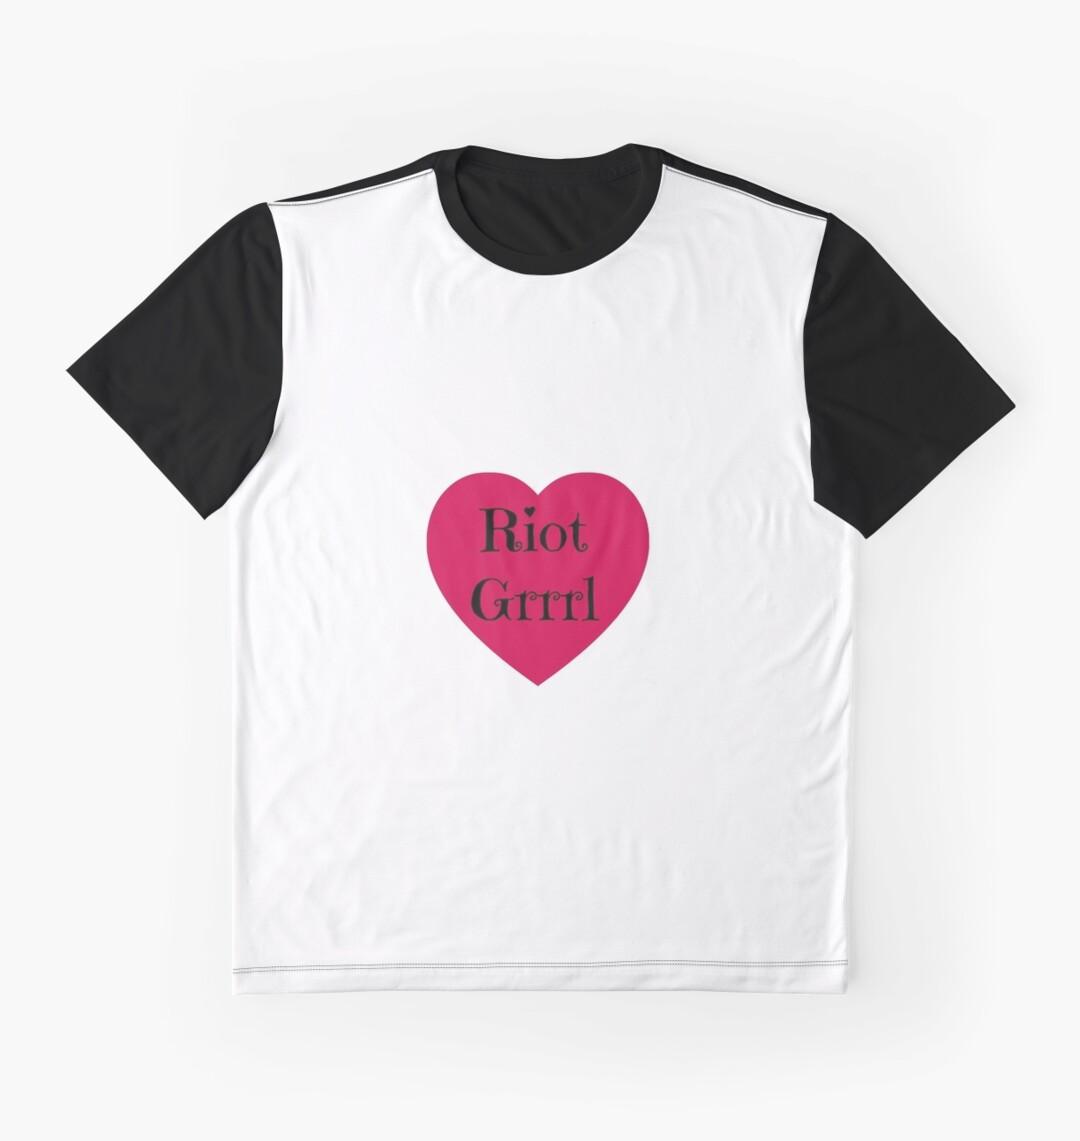 Heart design t shirt - Riot Grrrl Heart Design Feminist Feminism Punk Bikini Kill Graphic T Shirts